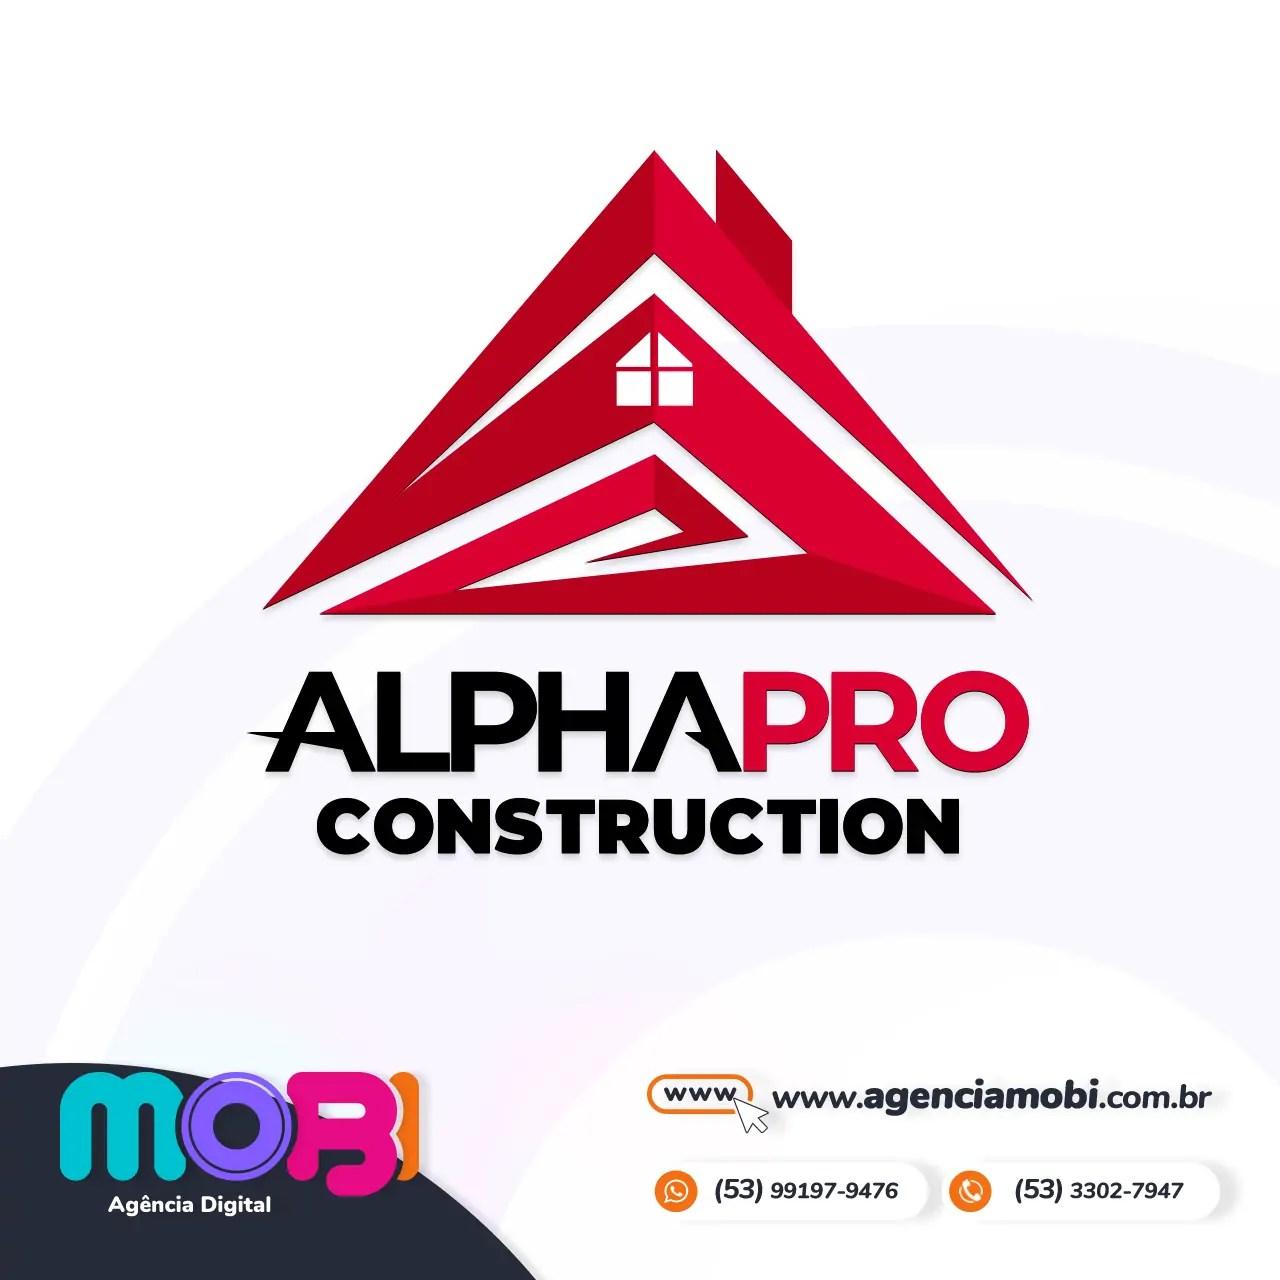 AlphaPro Construction